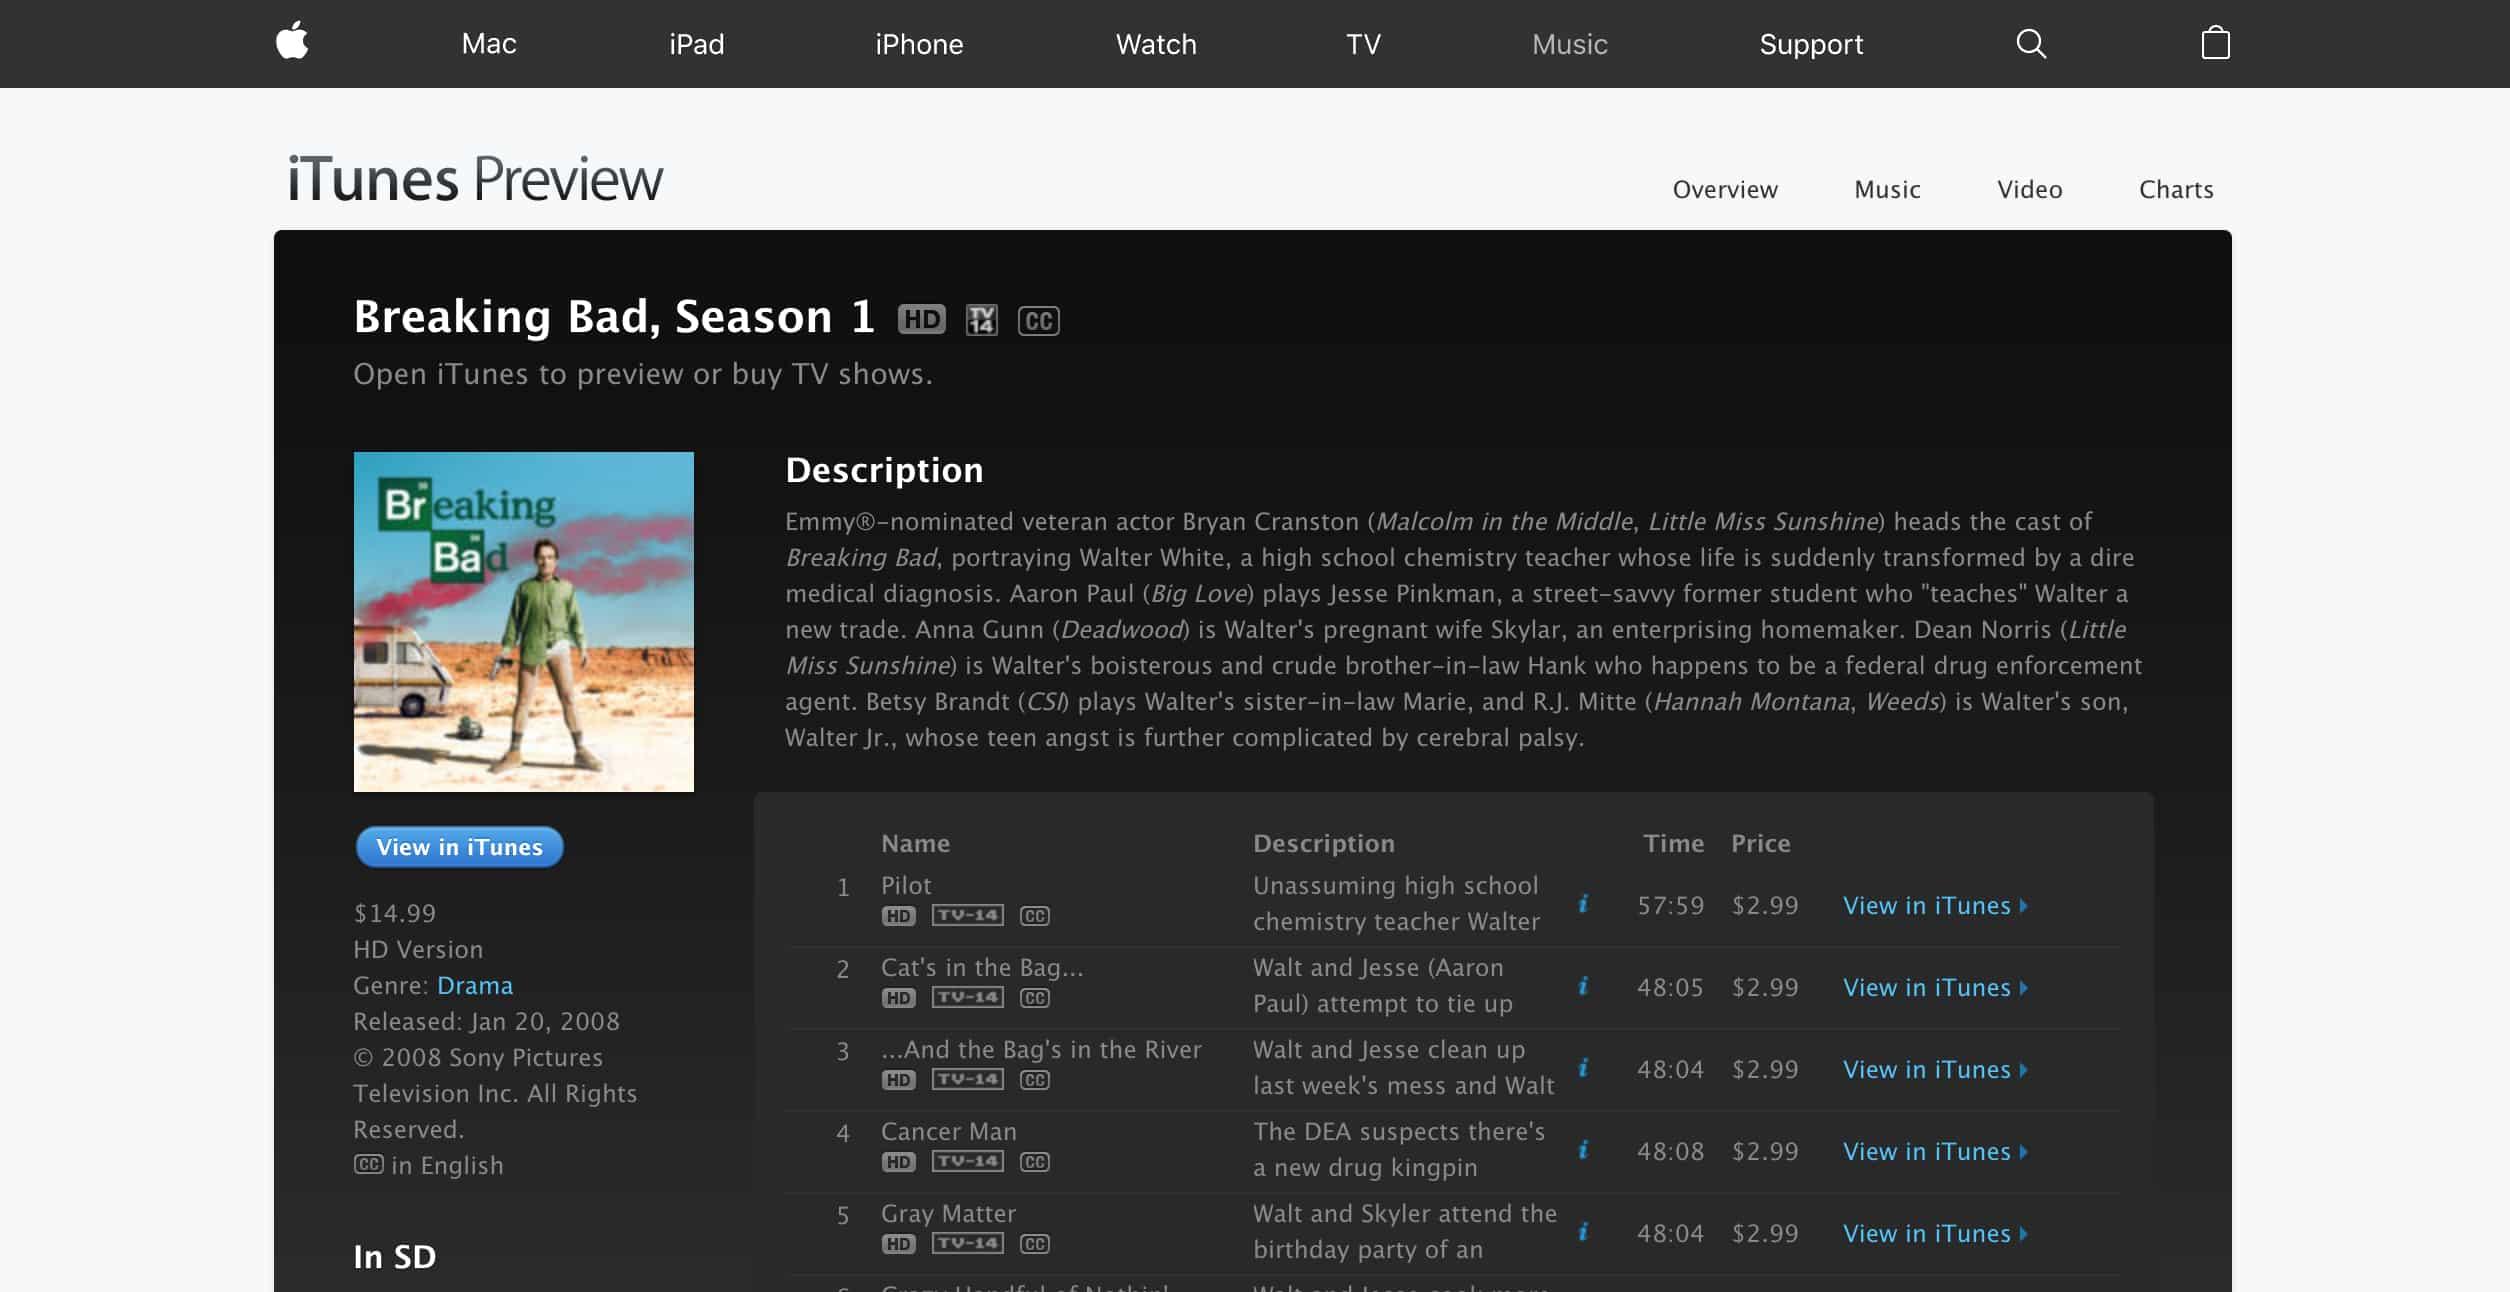 Breaking Bad Season 1 iTunes